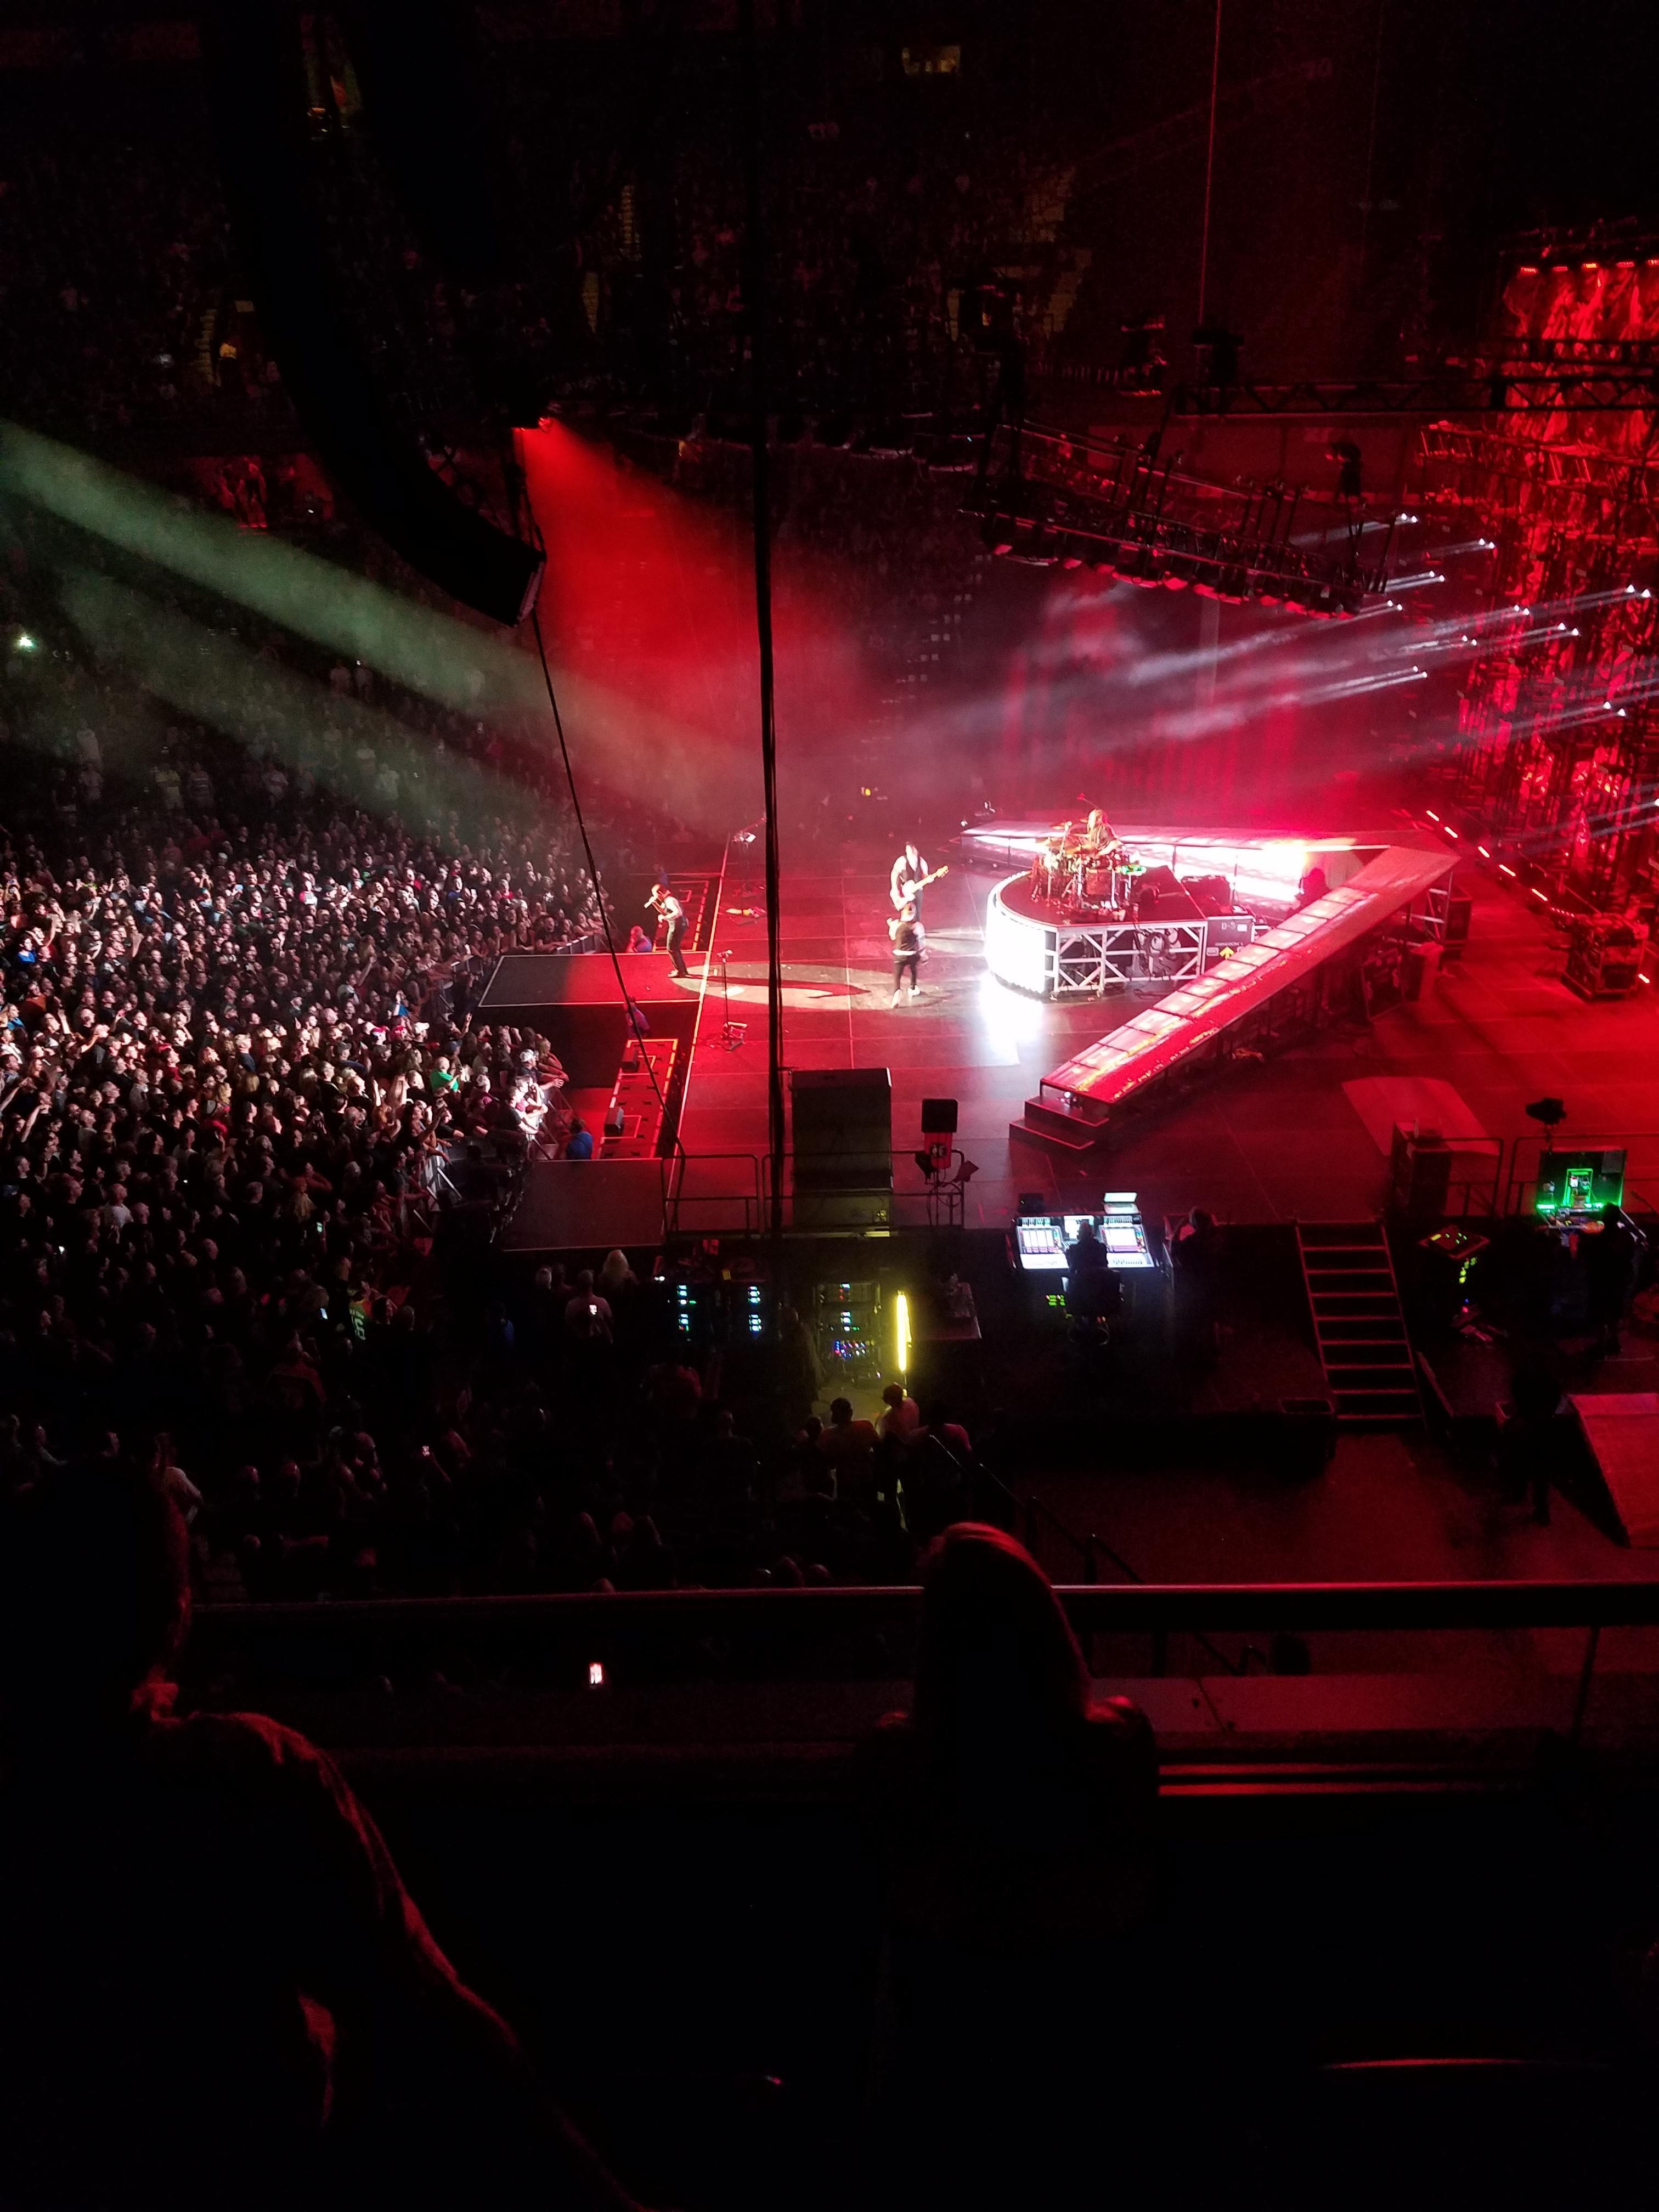 Mohegan Sun Arena Section 105 Row C Seat 6